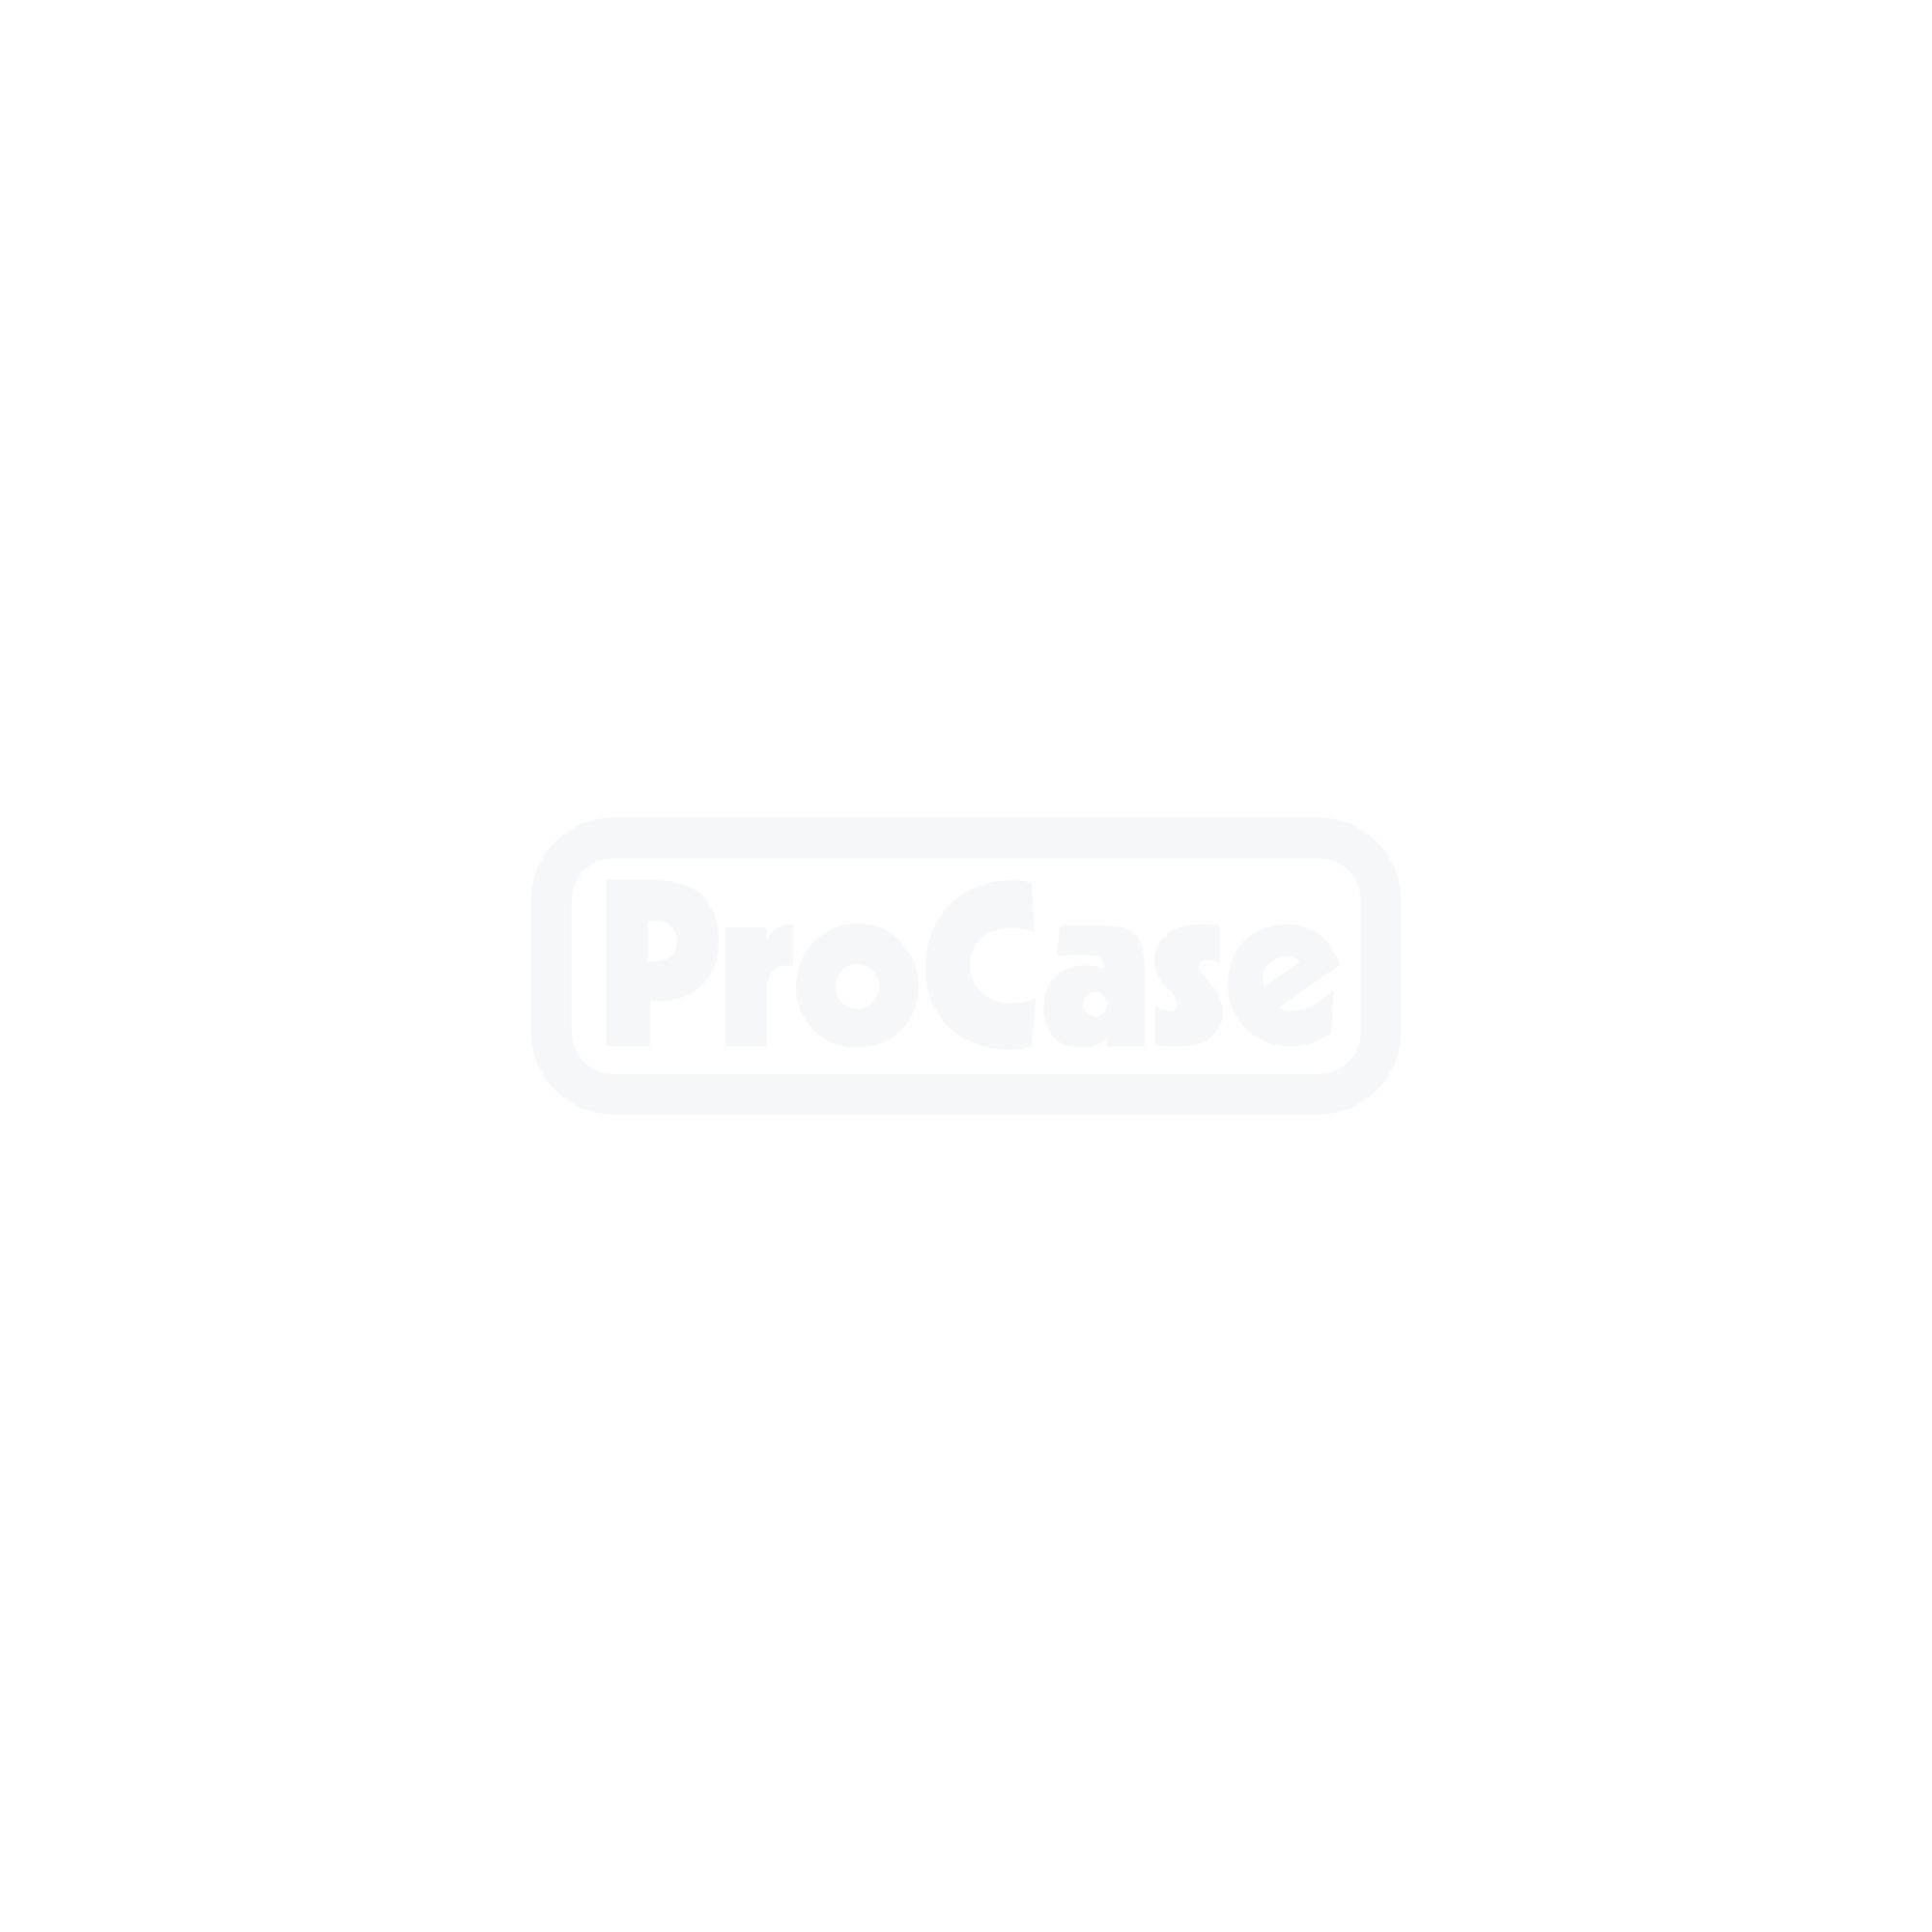 Stapelbox STB1-54 Sperrholzkiste